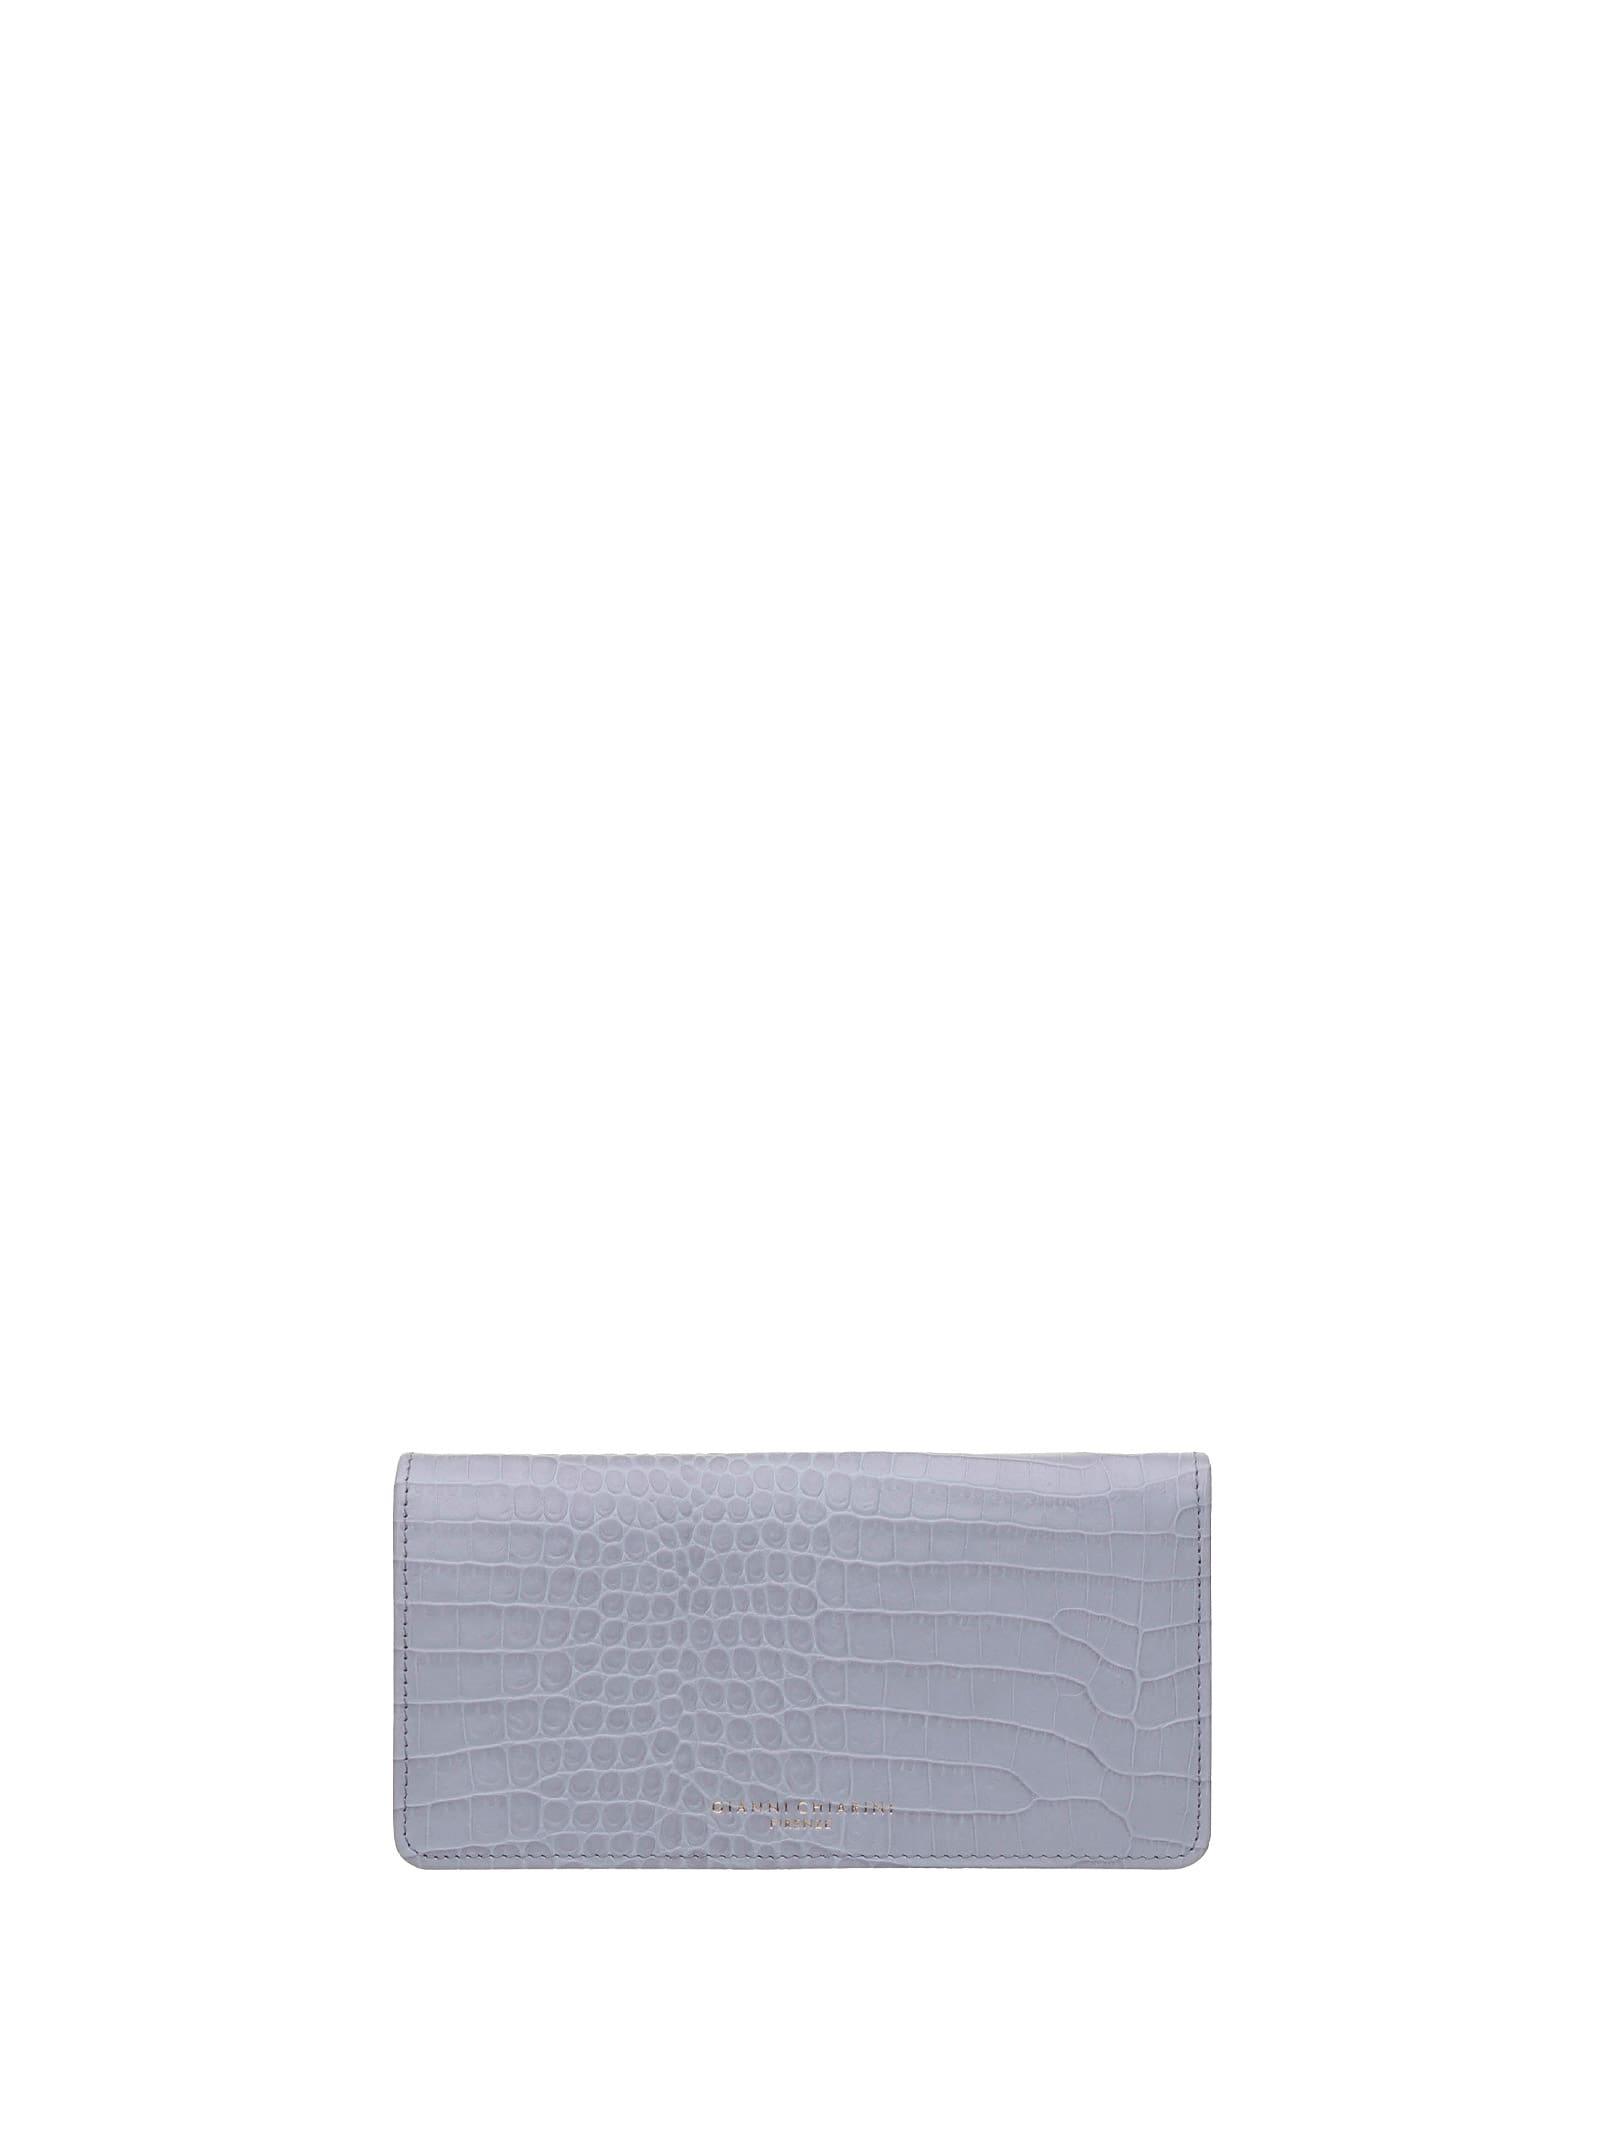 Gianni Chiarini Cocco-print Wallet In Polvere